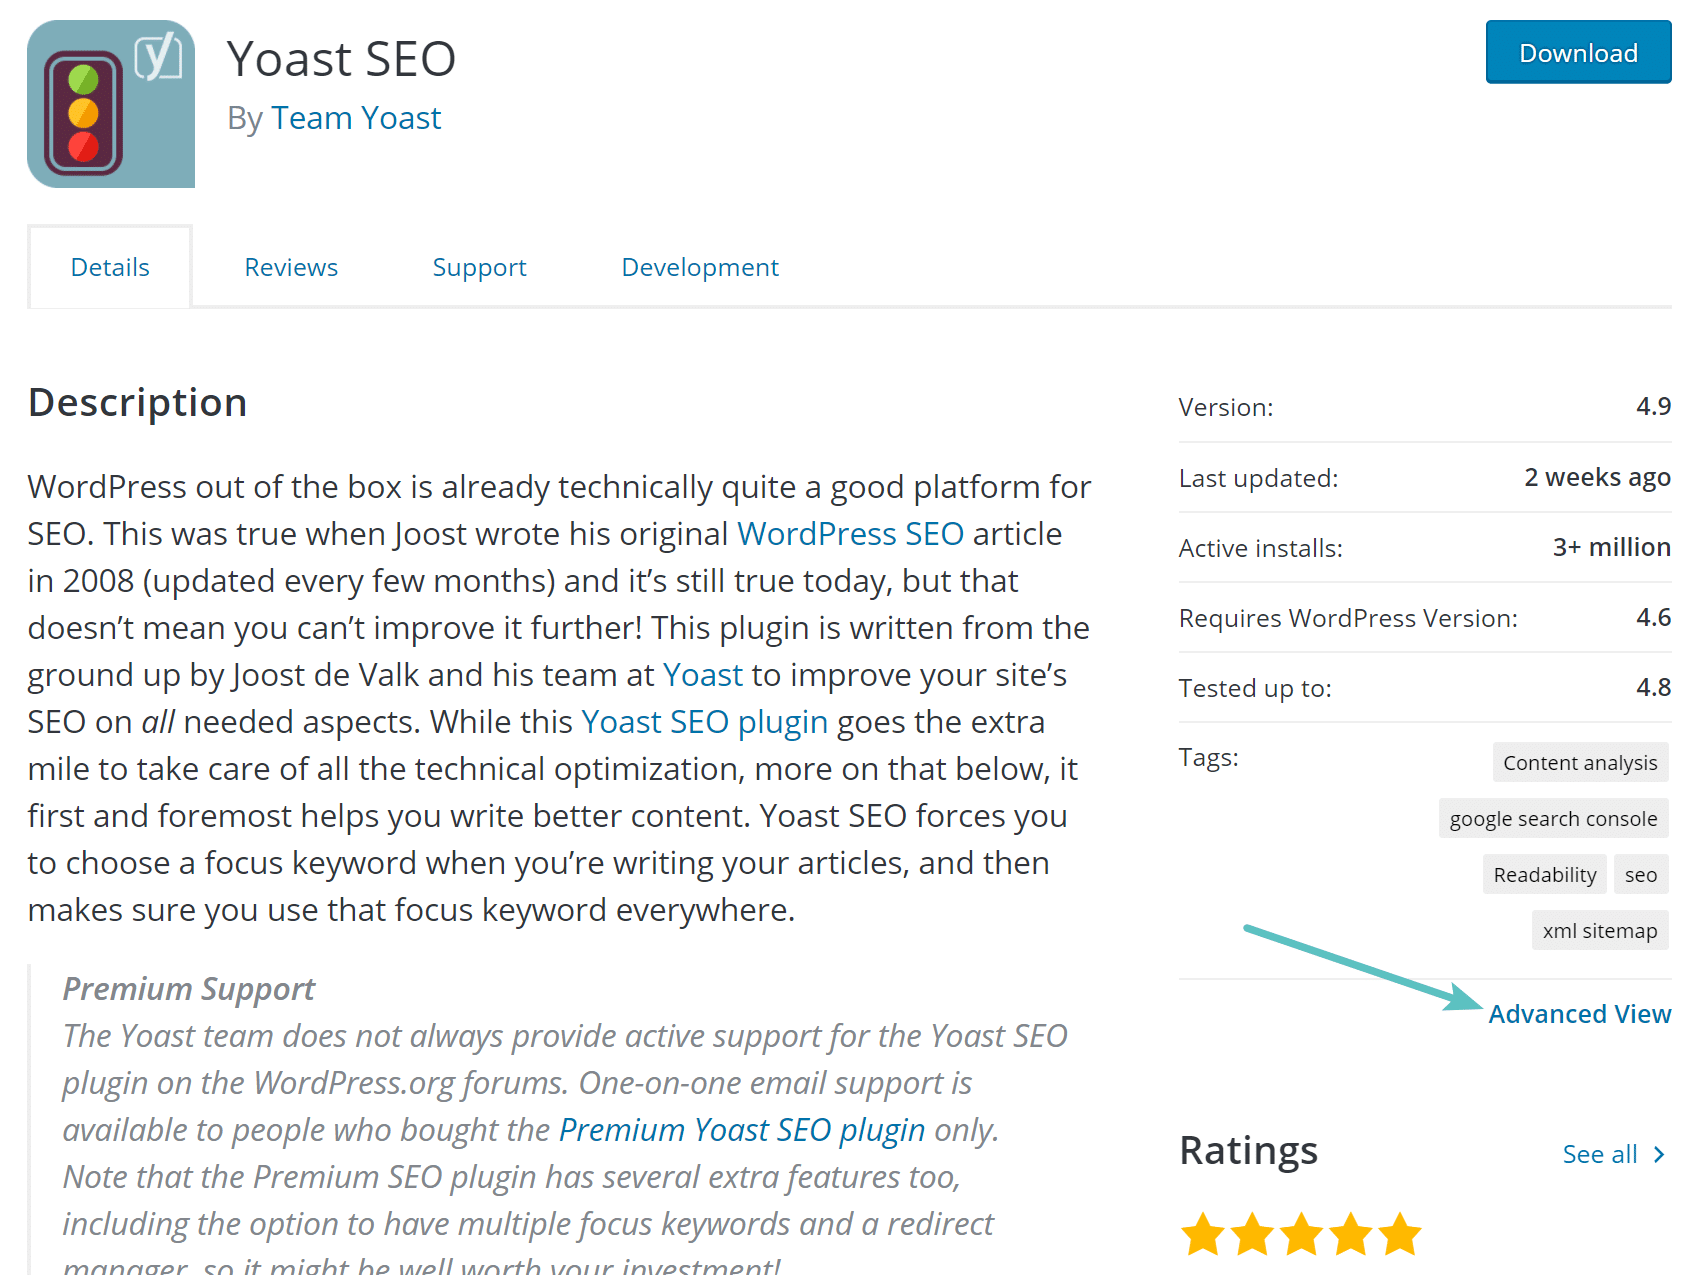 Vue avancée de l'extension WordPress